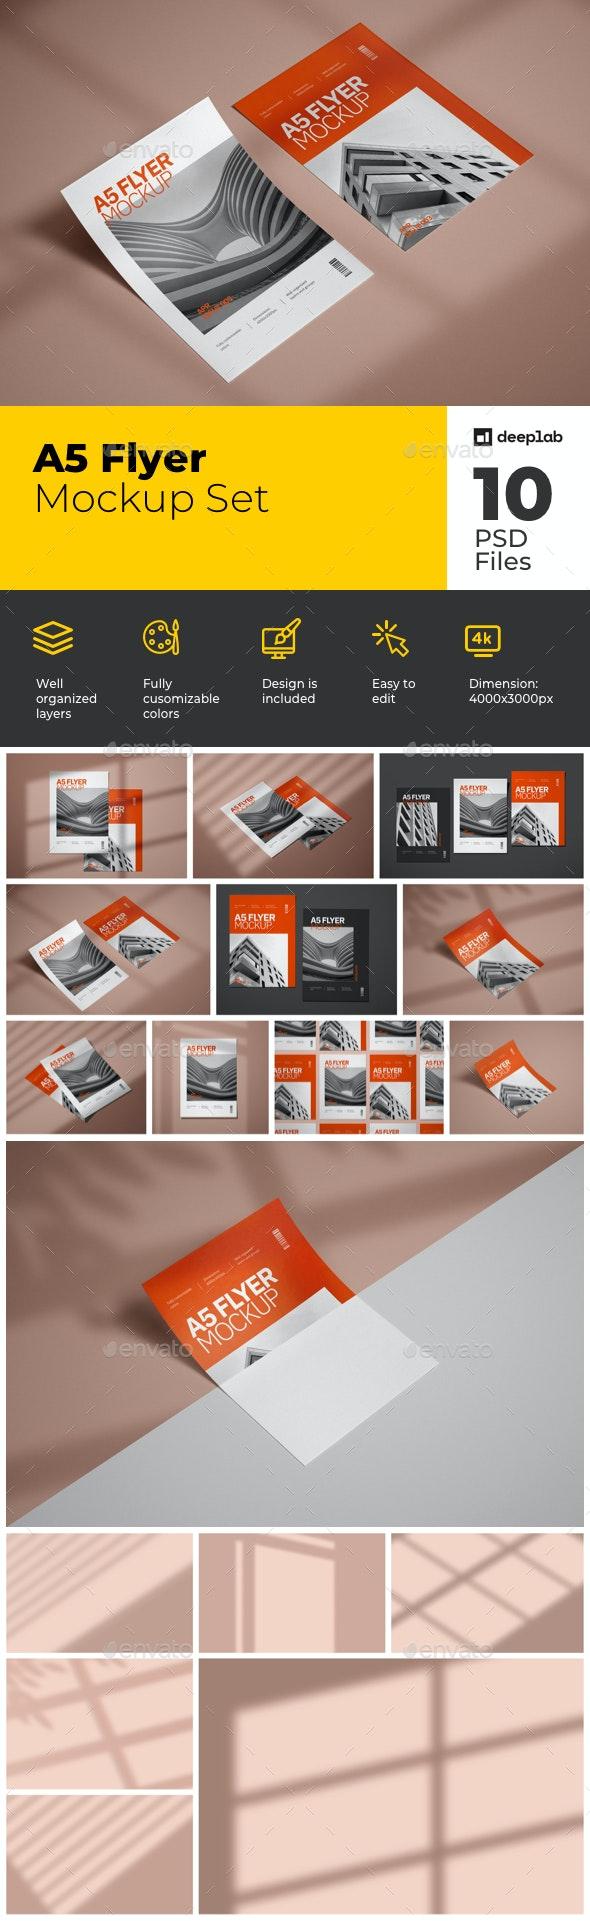 A5 Flyer Mockup Set - Product Mock-Ups Graphics